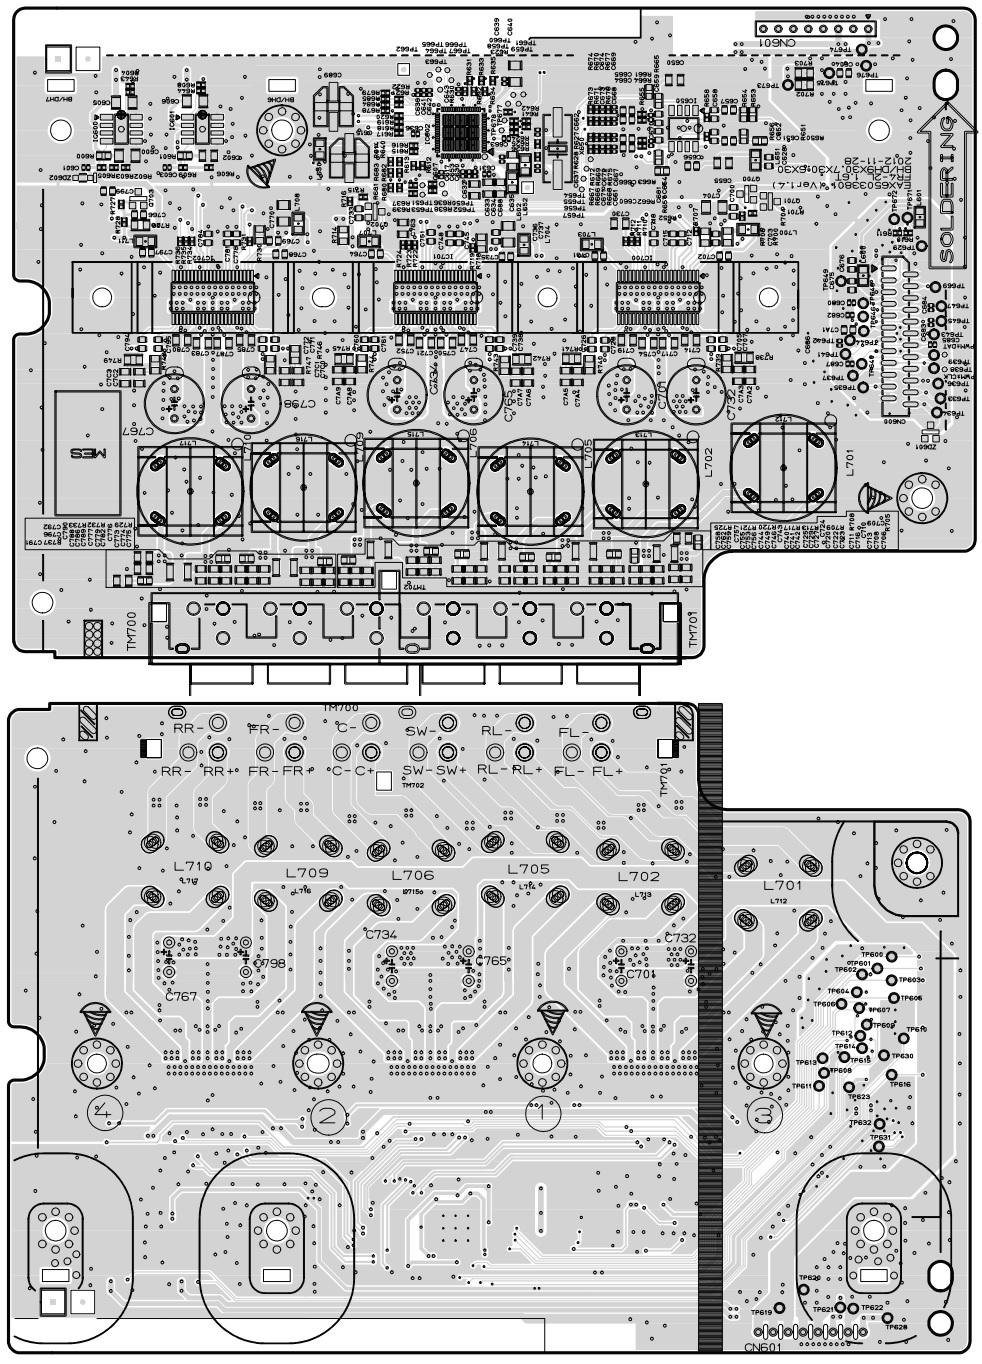 Contemporary Str W6553 Tv Circuit Diagram Power Supply Component ...